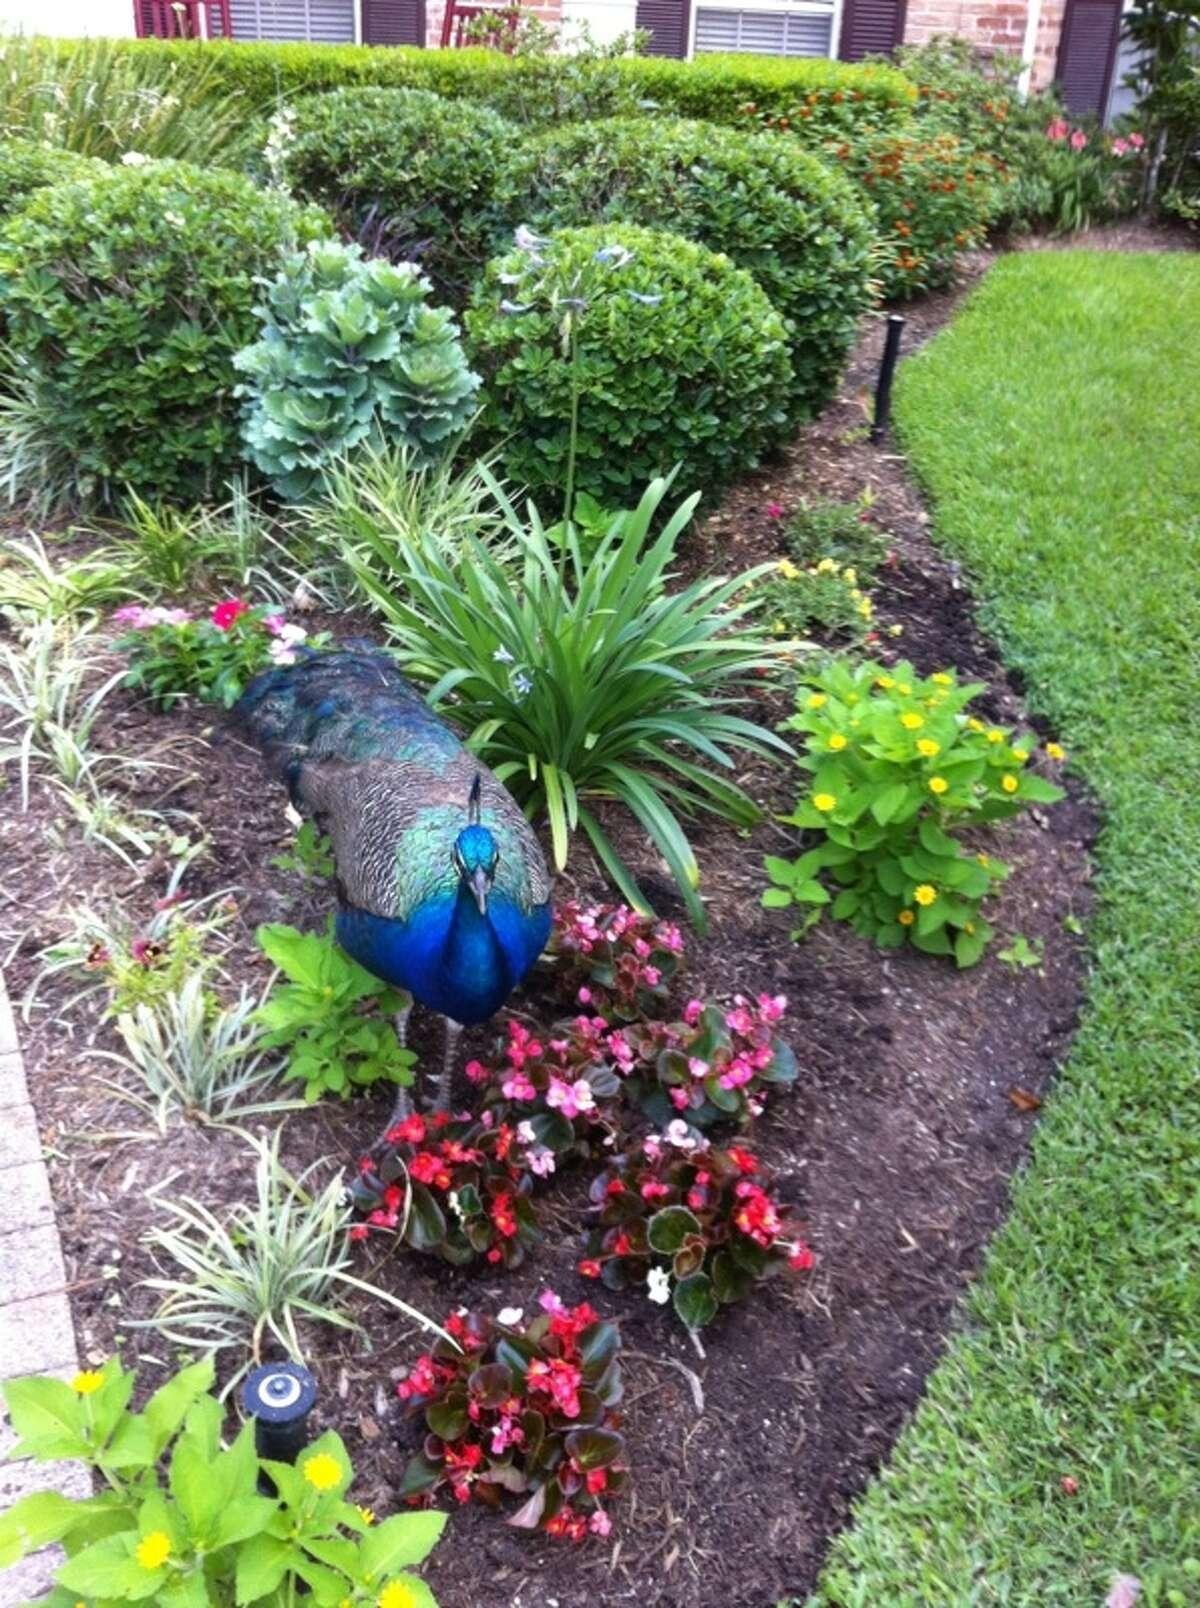 Feral peacock as garden ornament in Nottingham Forest.